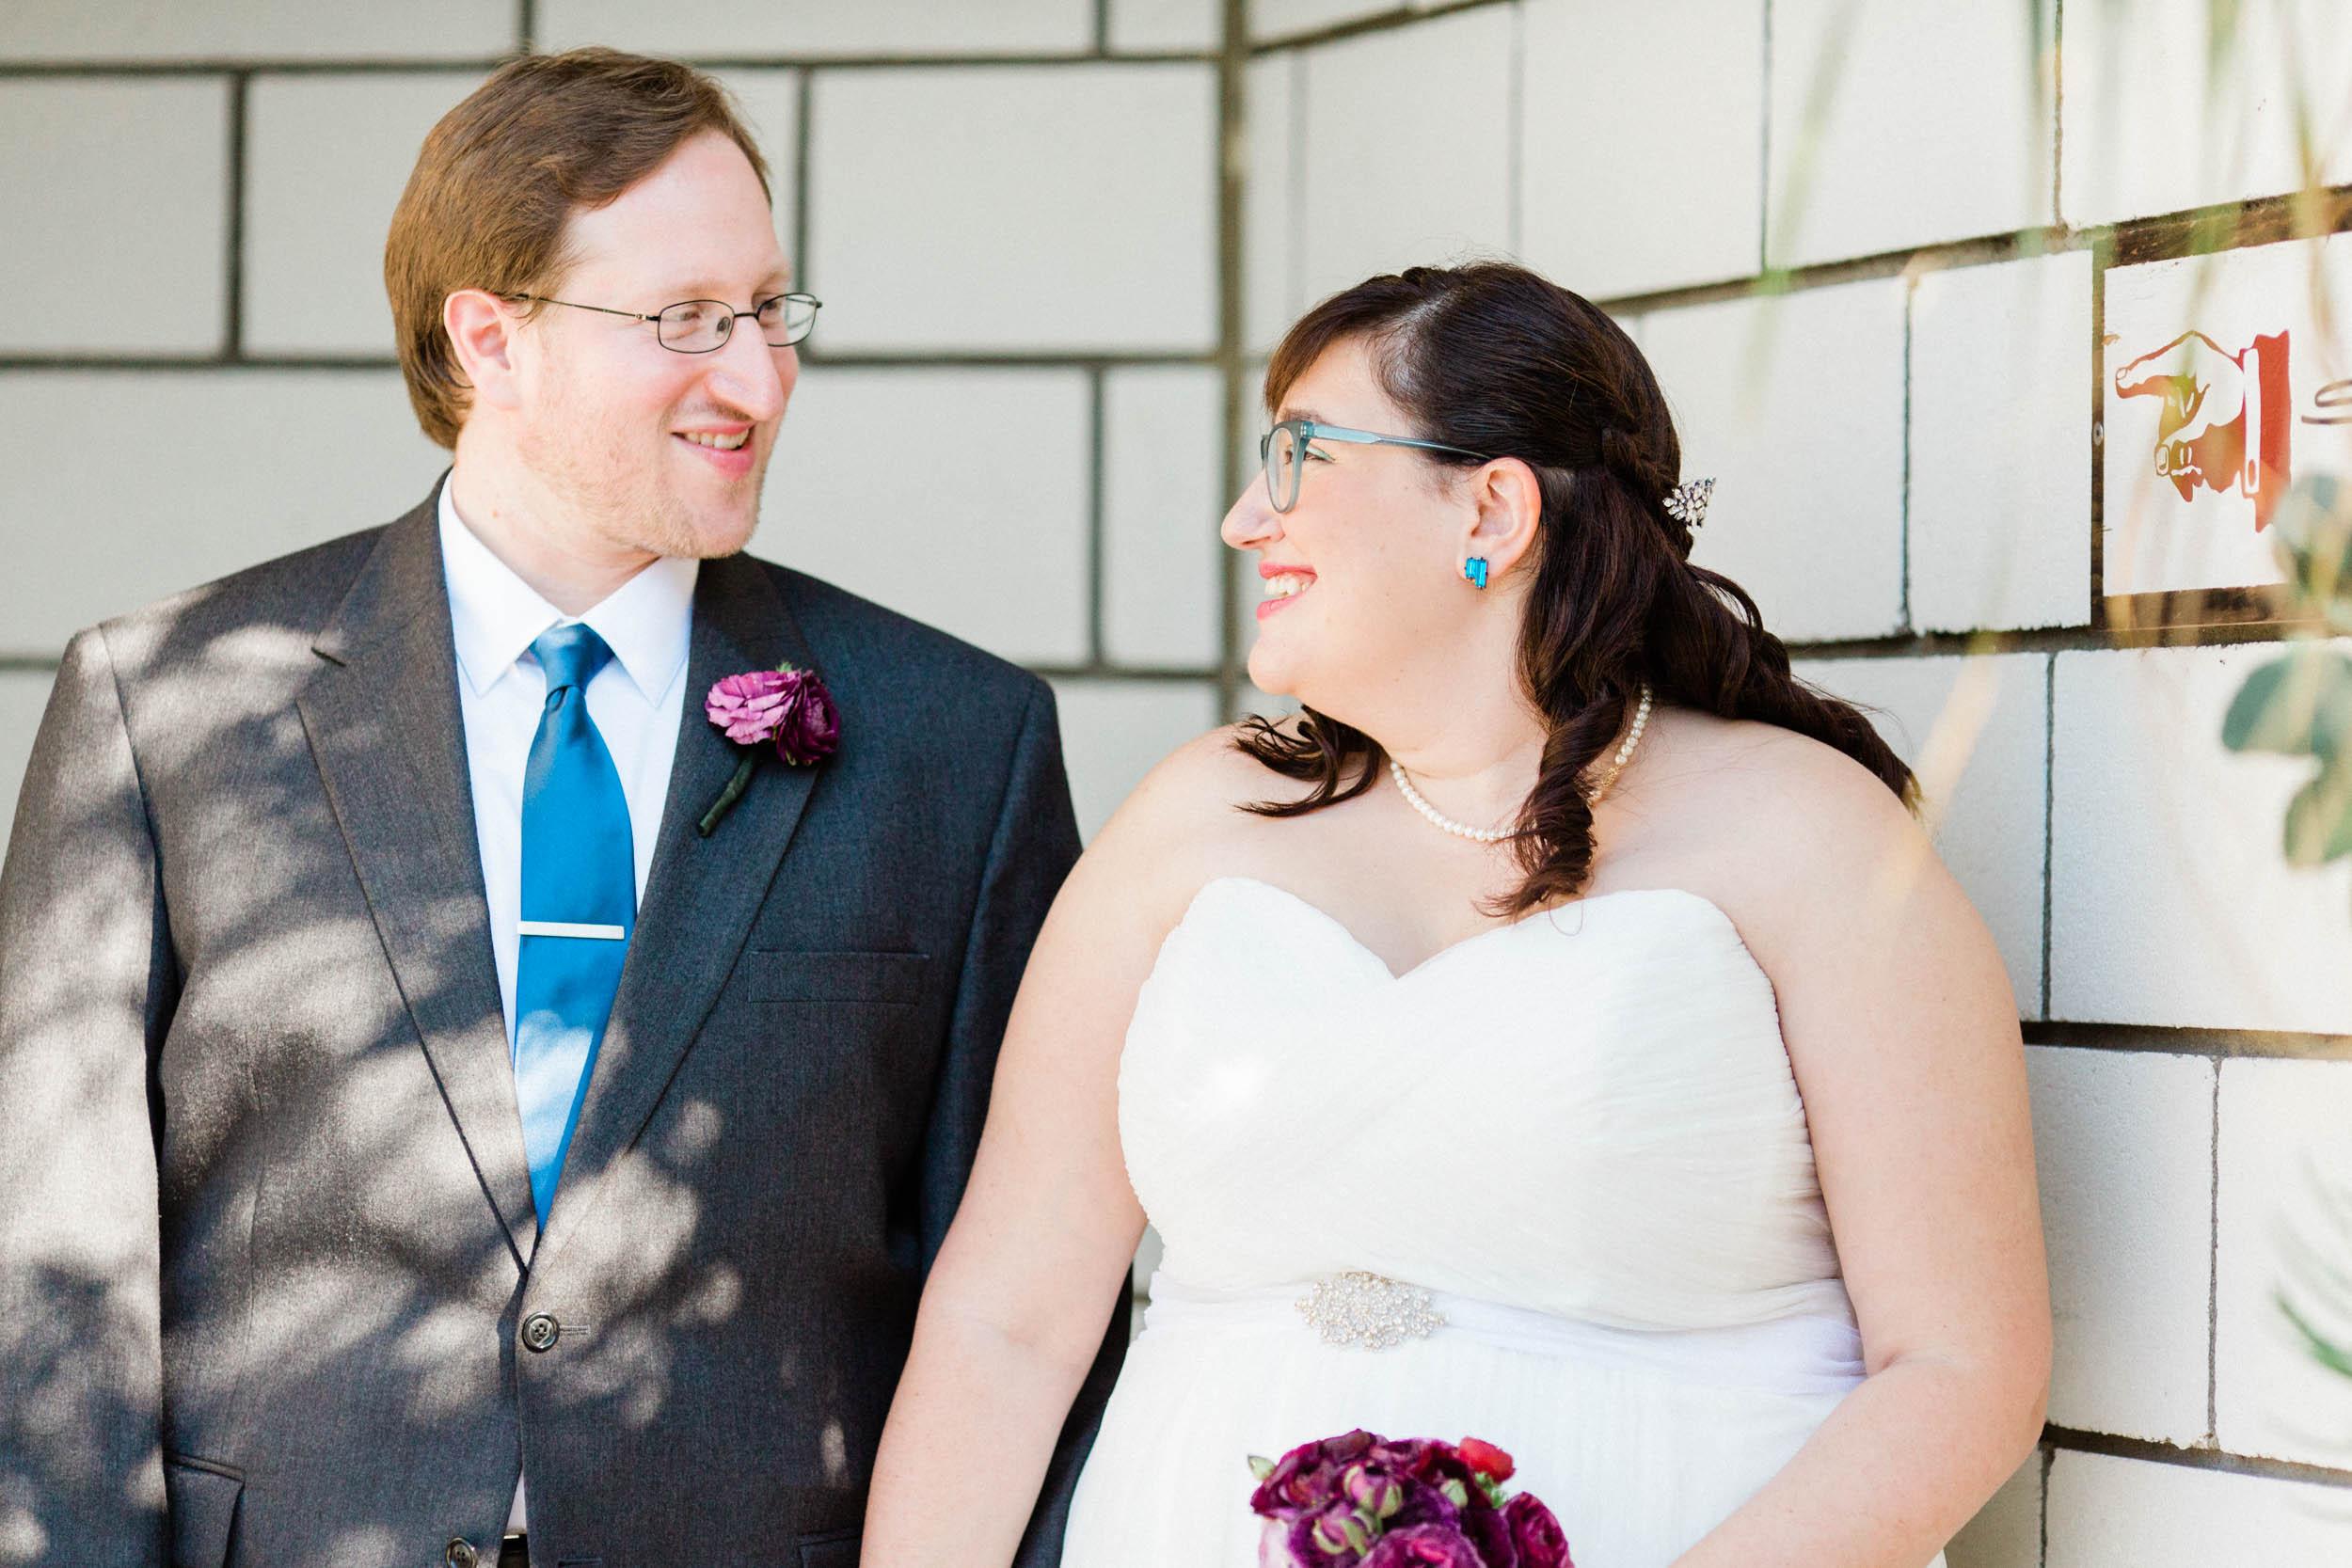 BKM-Photography-Smog-Shoppe-Culver-City-Wedding-Photographer-Culver-Hotel-0027.jpg